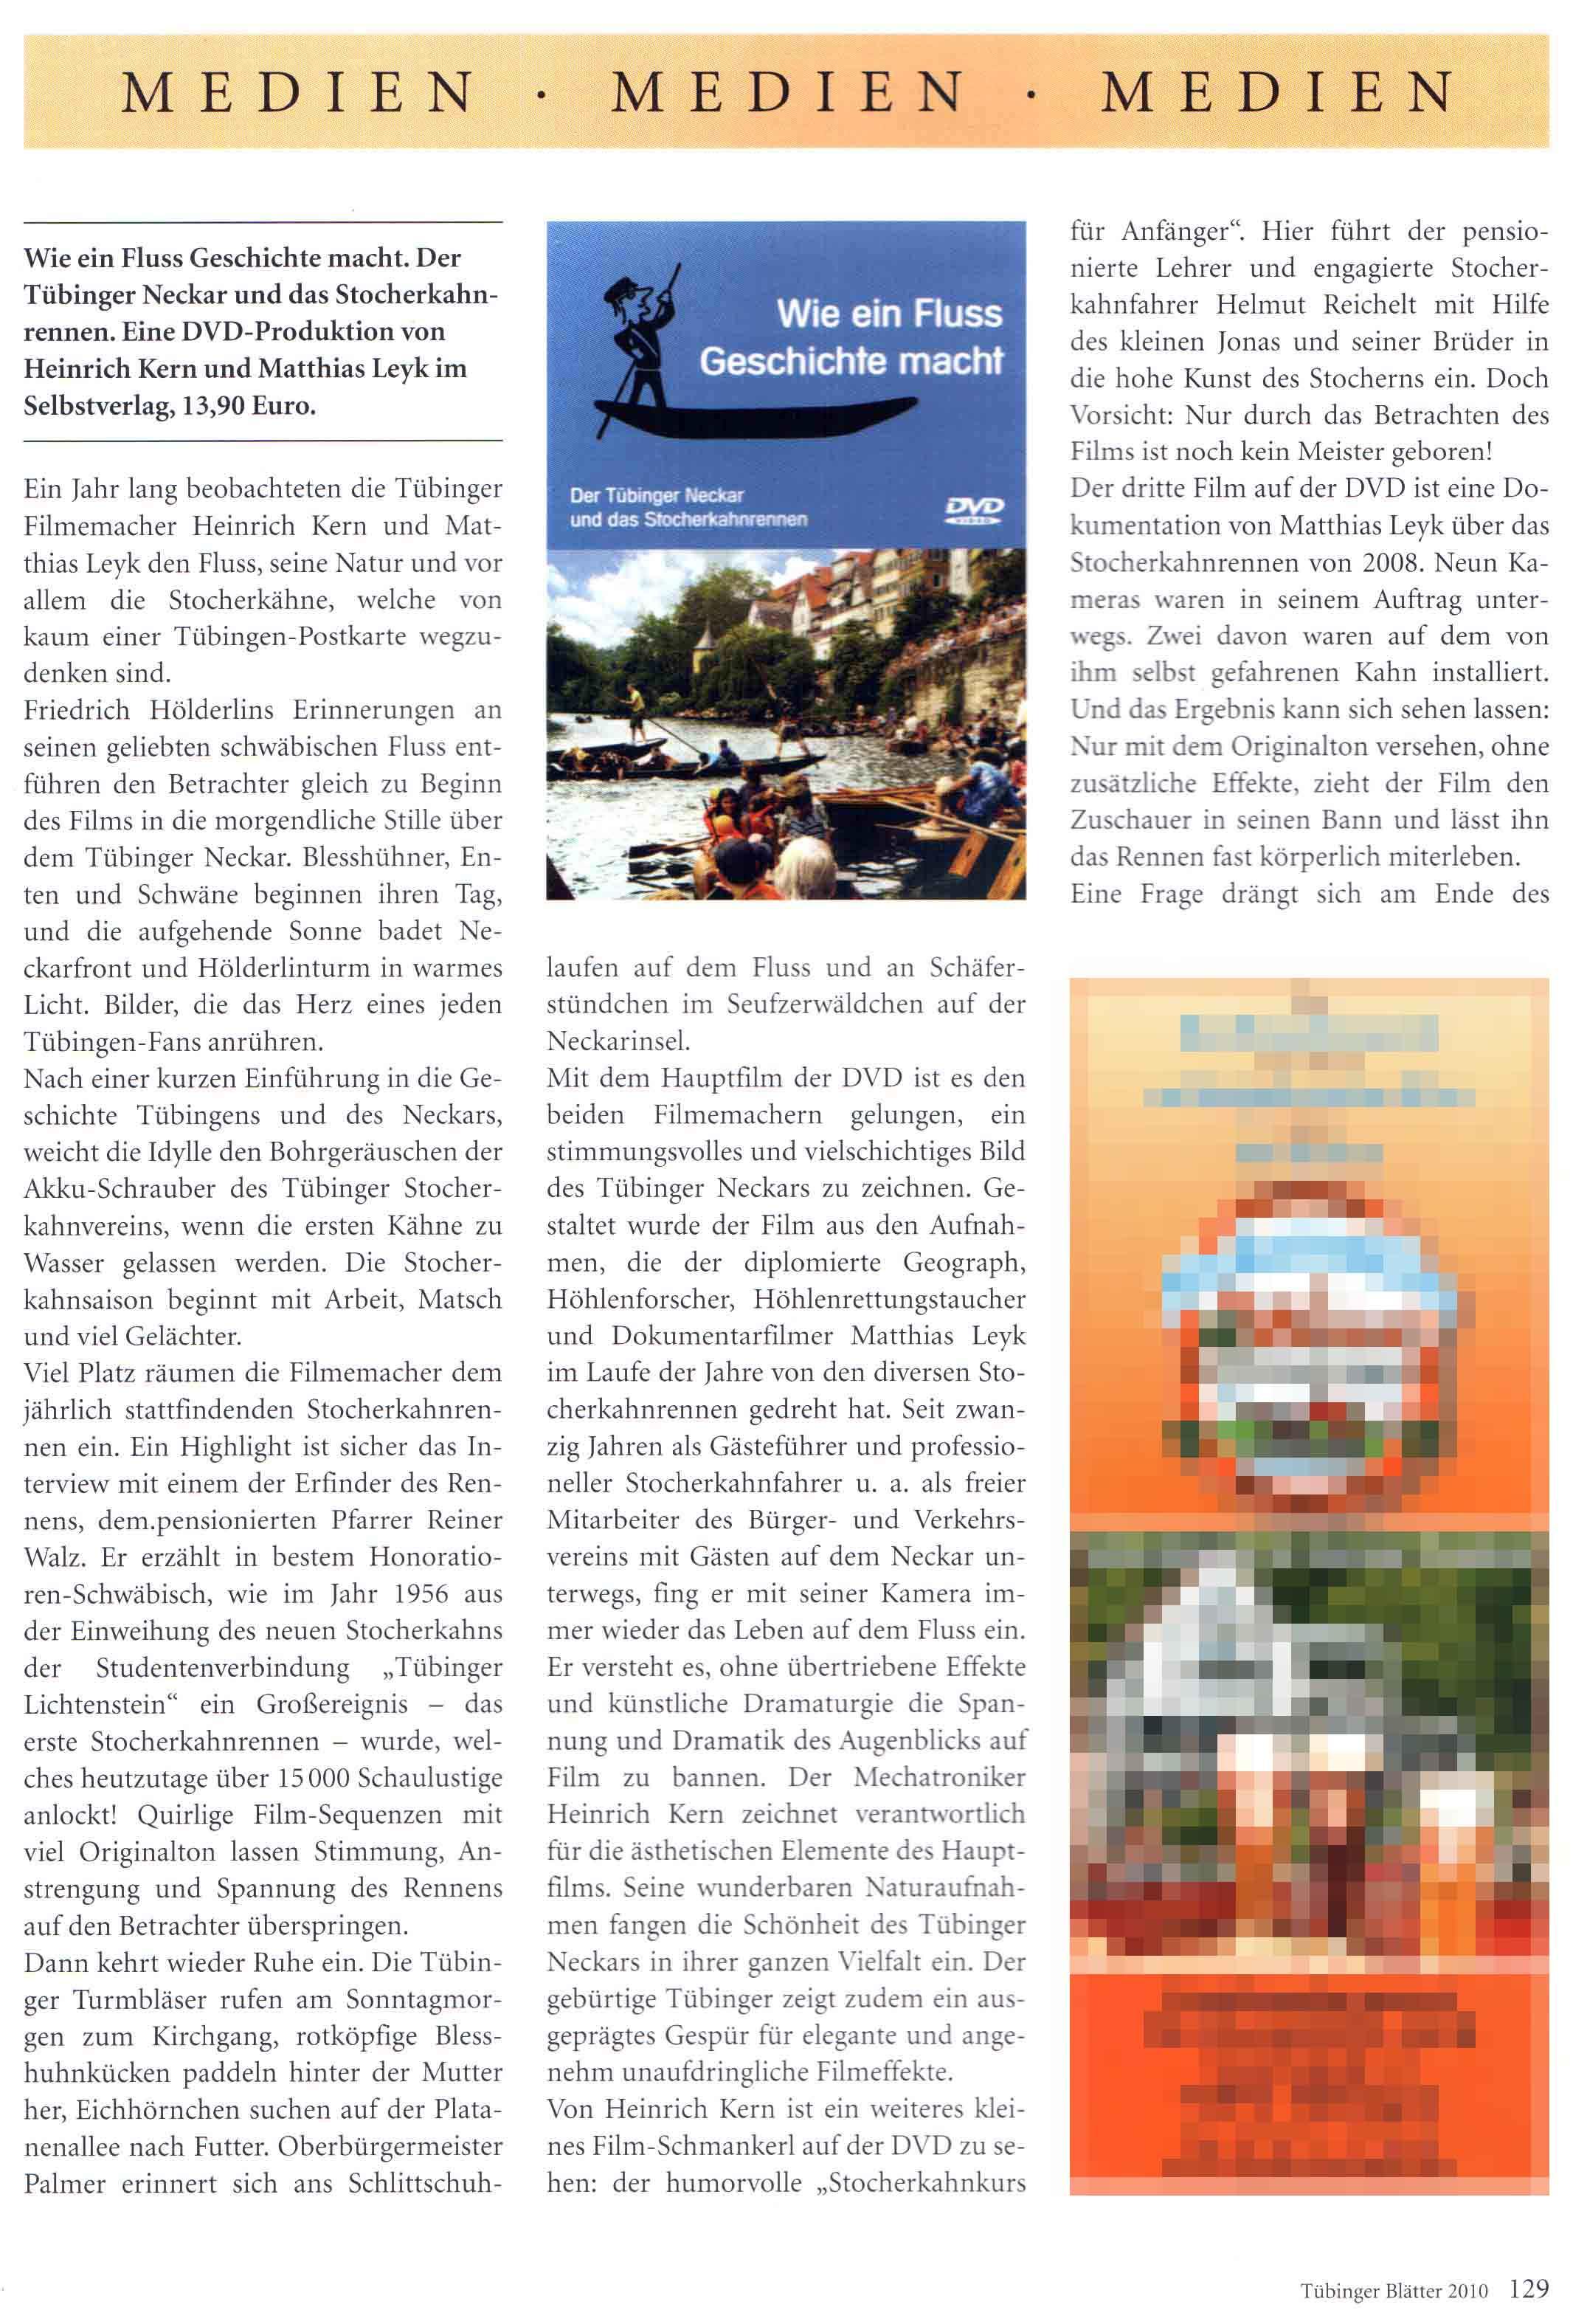 Presse Tuebinger Blätter 1